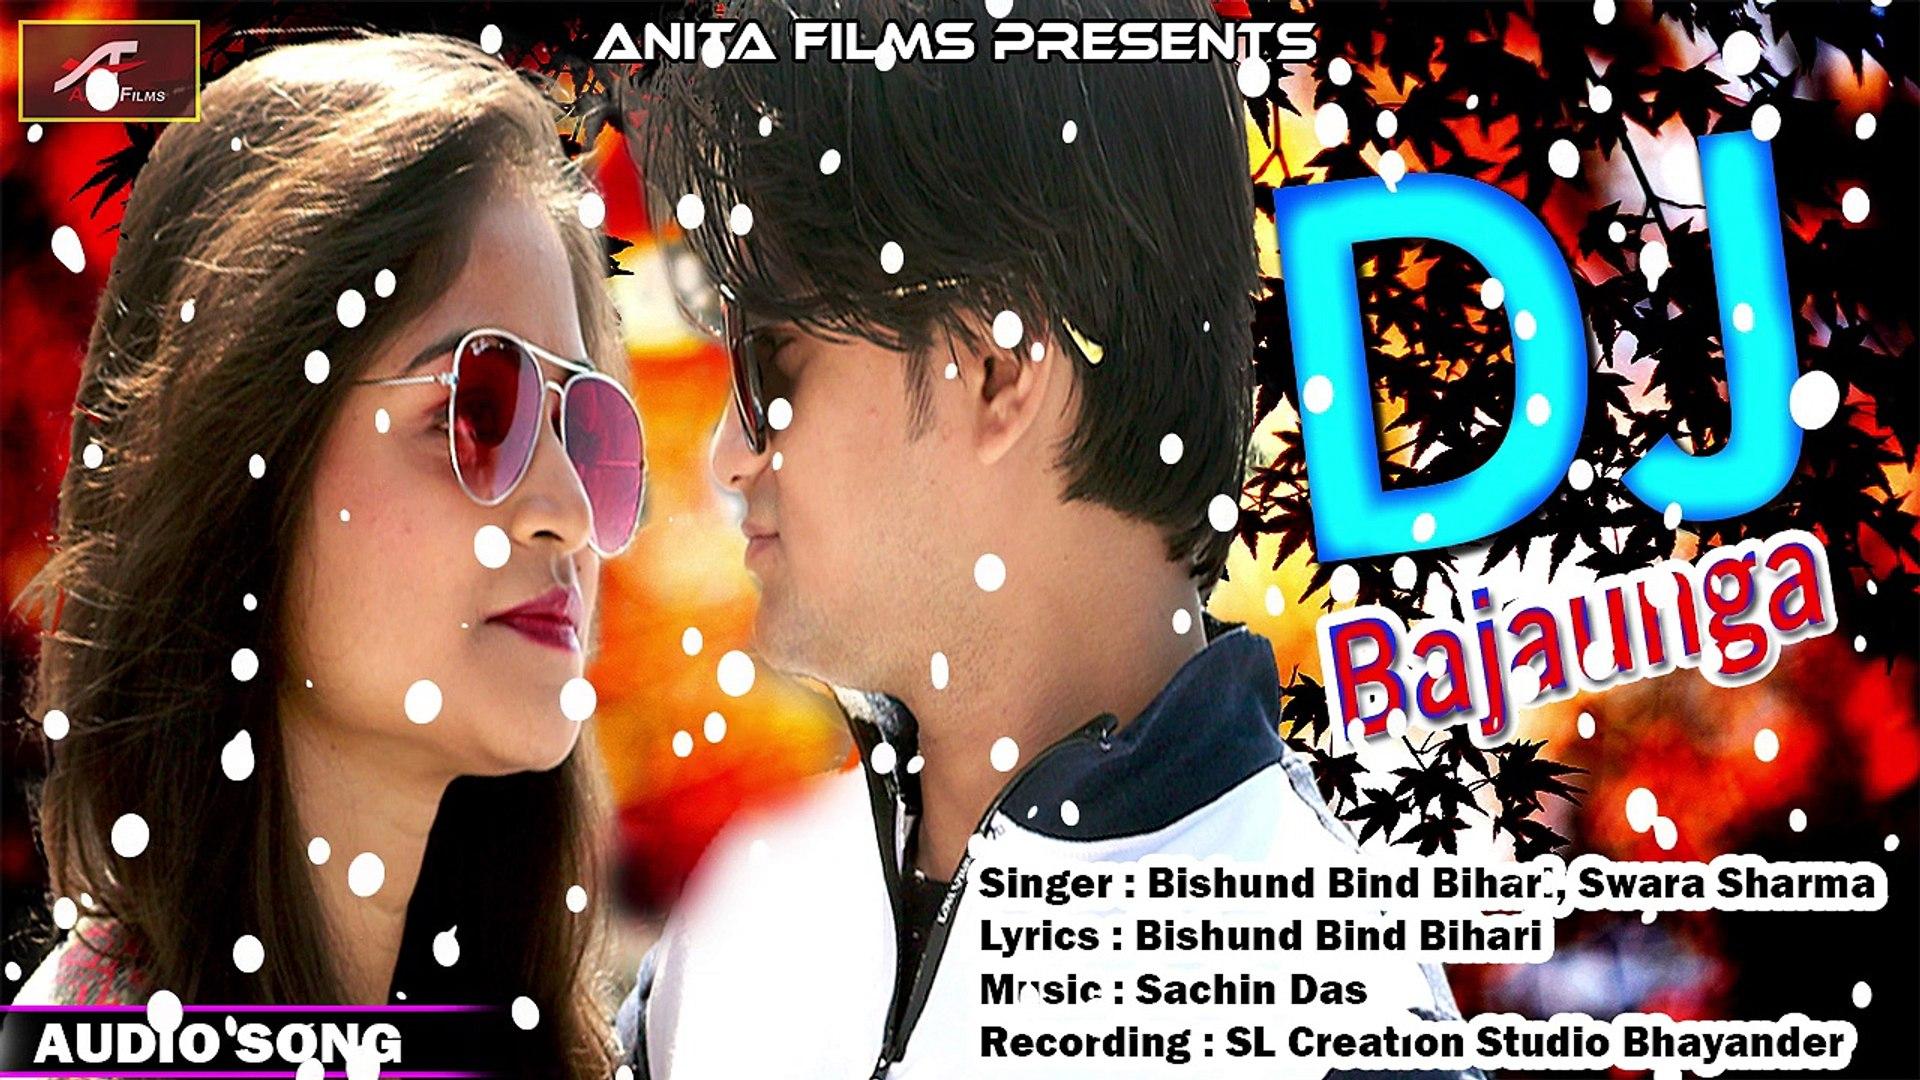 Latest Hindi Song 2018 | DJ Bajaunga (FULL Song) | New Audio Song |  Bollywood Song | Swara Sharma - Bishund Bind Bihari